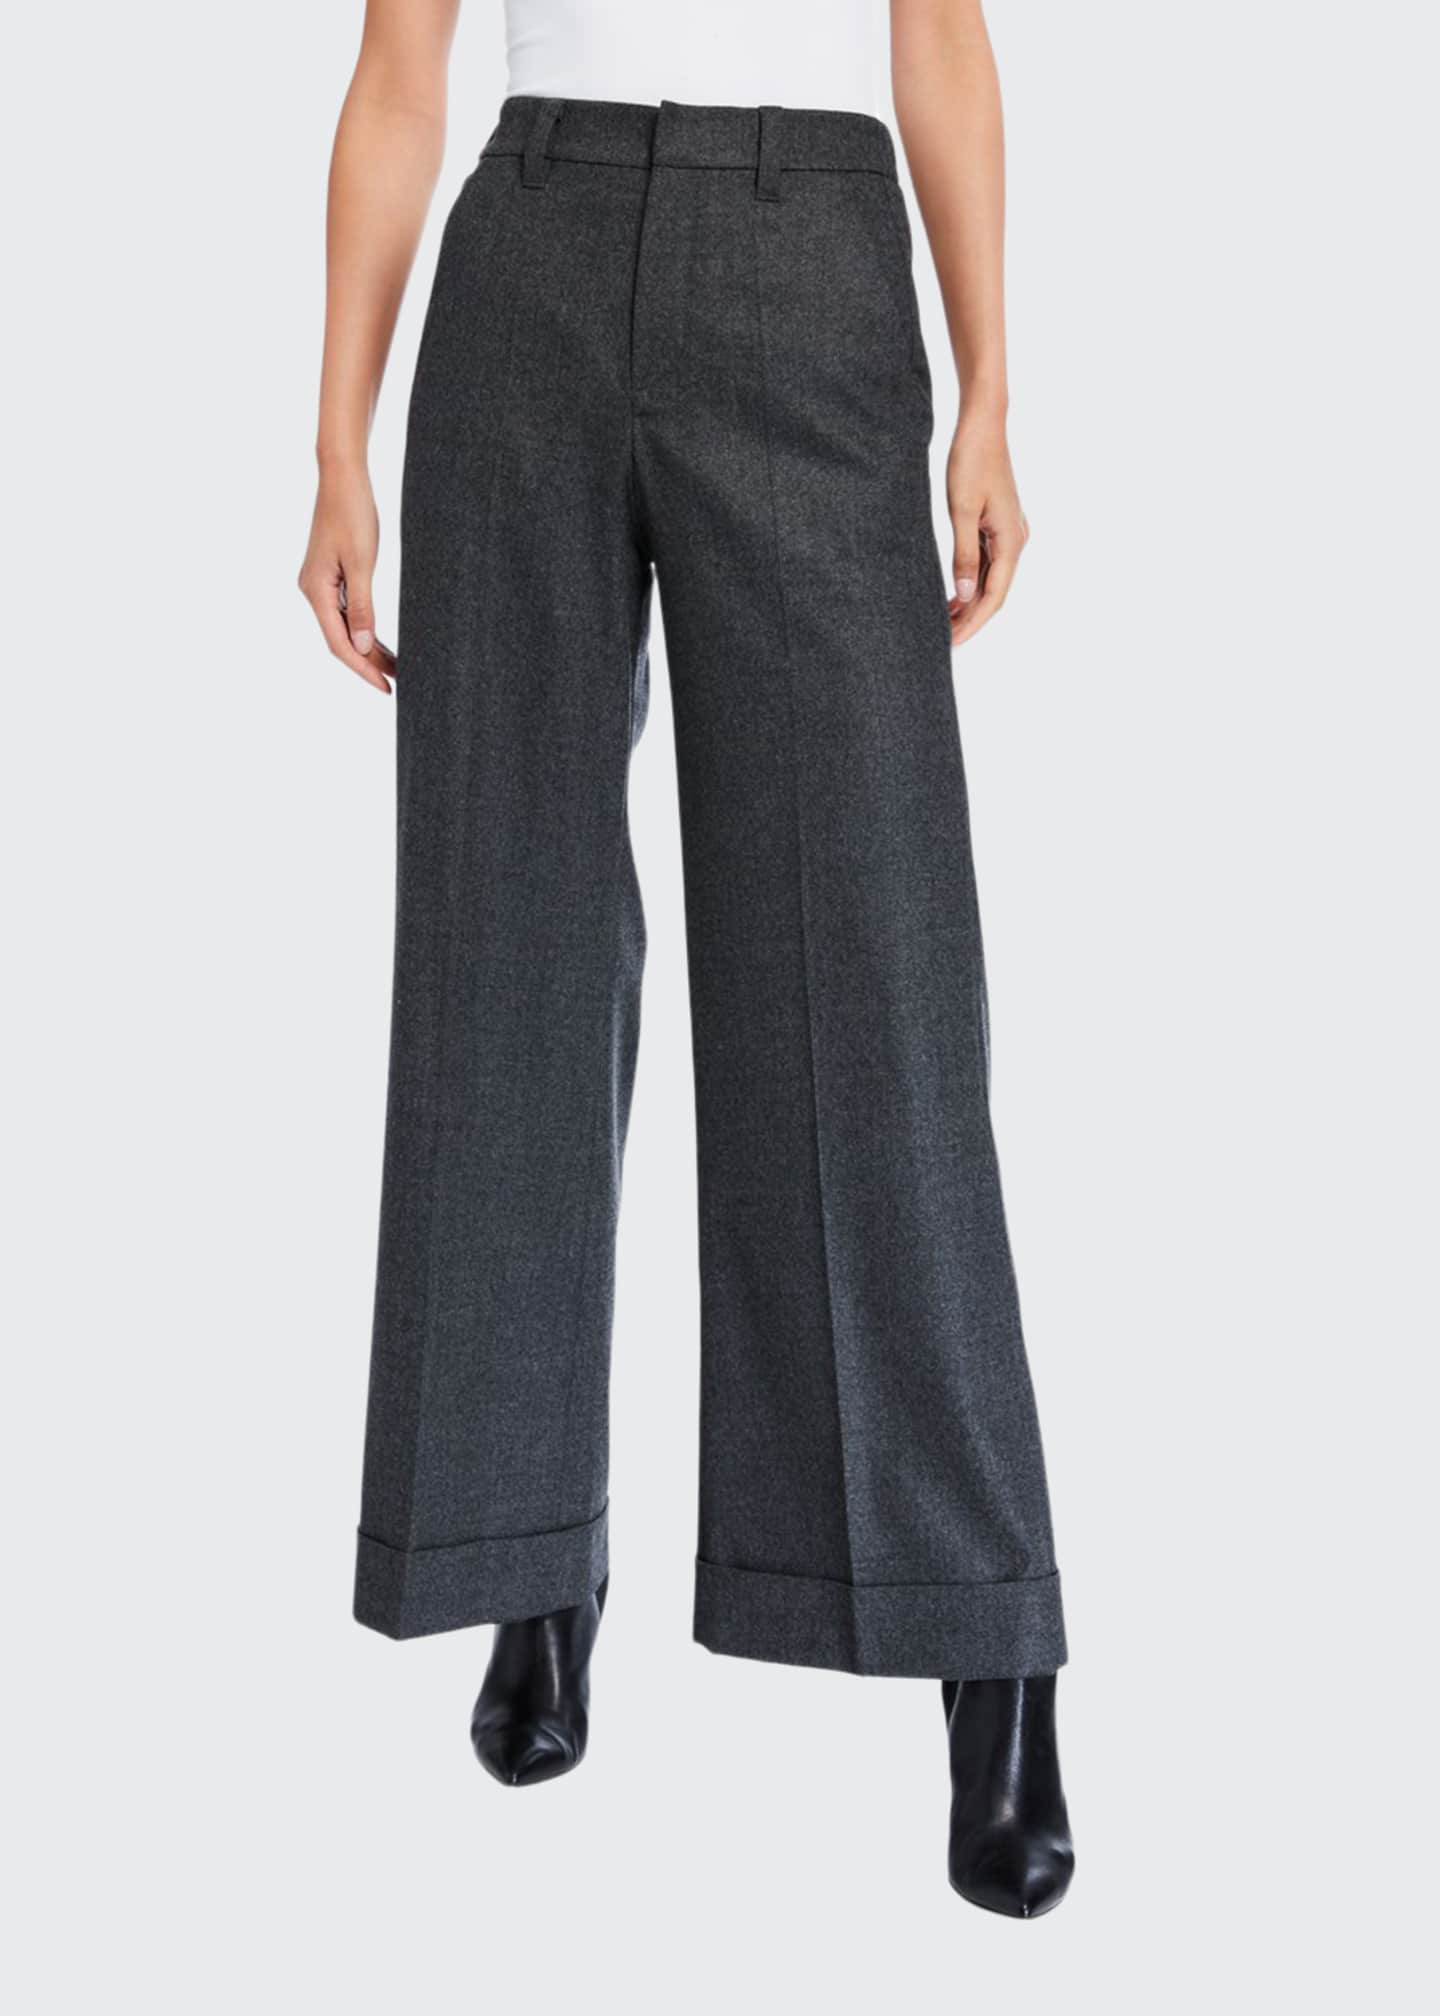 Brunello Cucinelli Flannel Wide-Leg Trousers